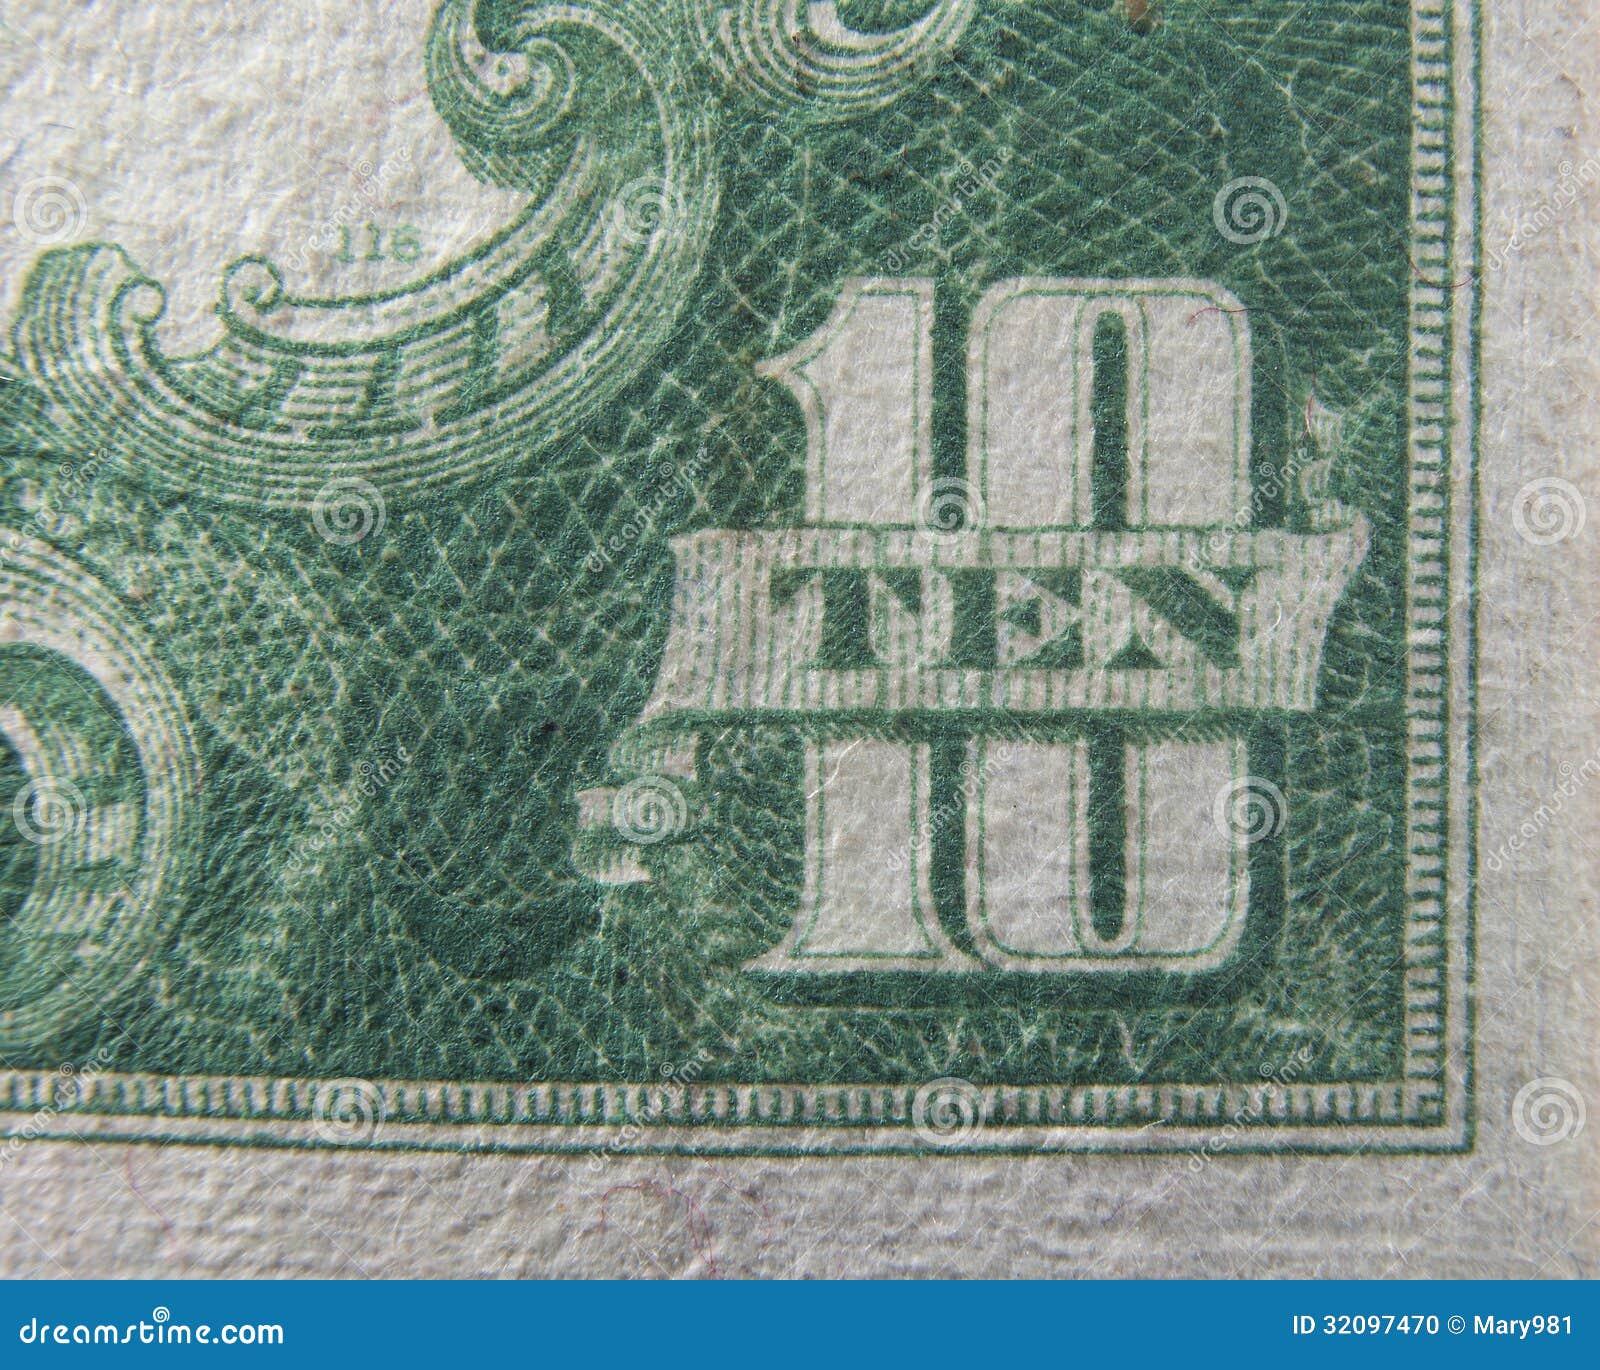 Download Dj Dollar Bill: Ten 10 Dollars US Currency Stock Photo. Image Of America